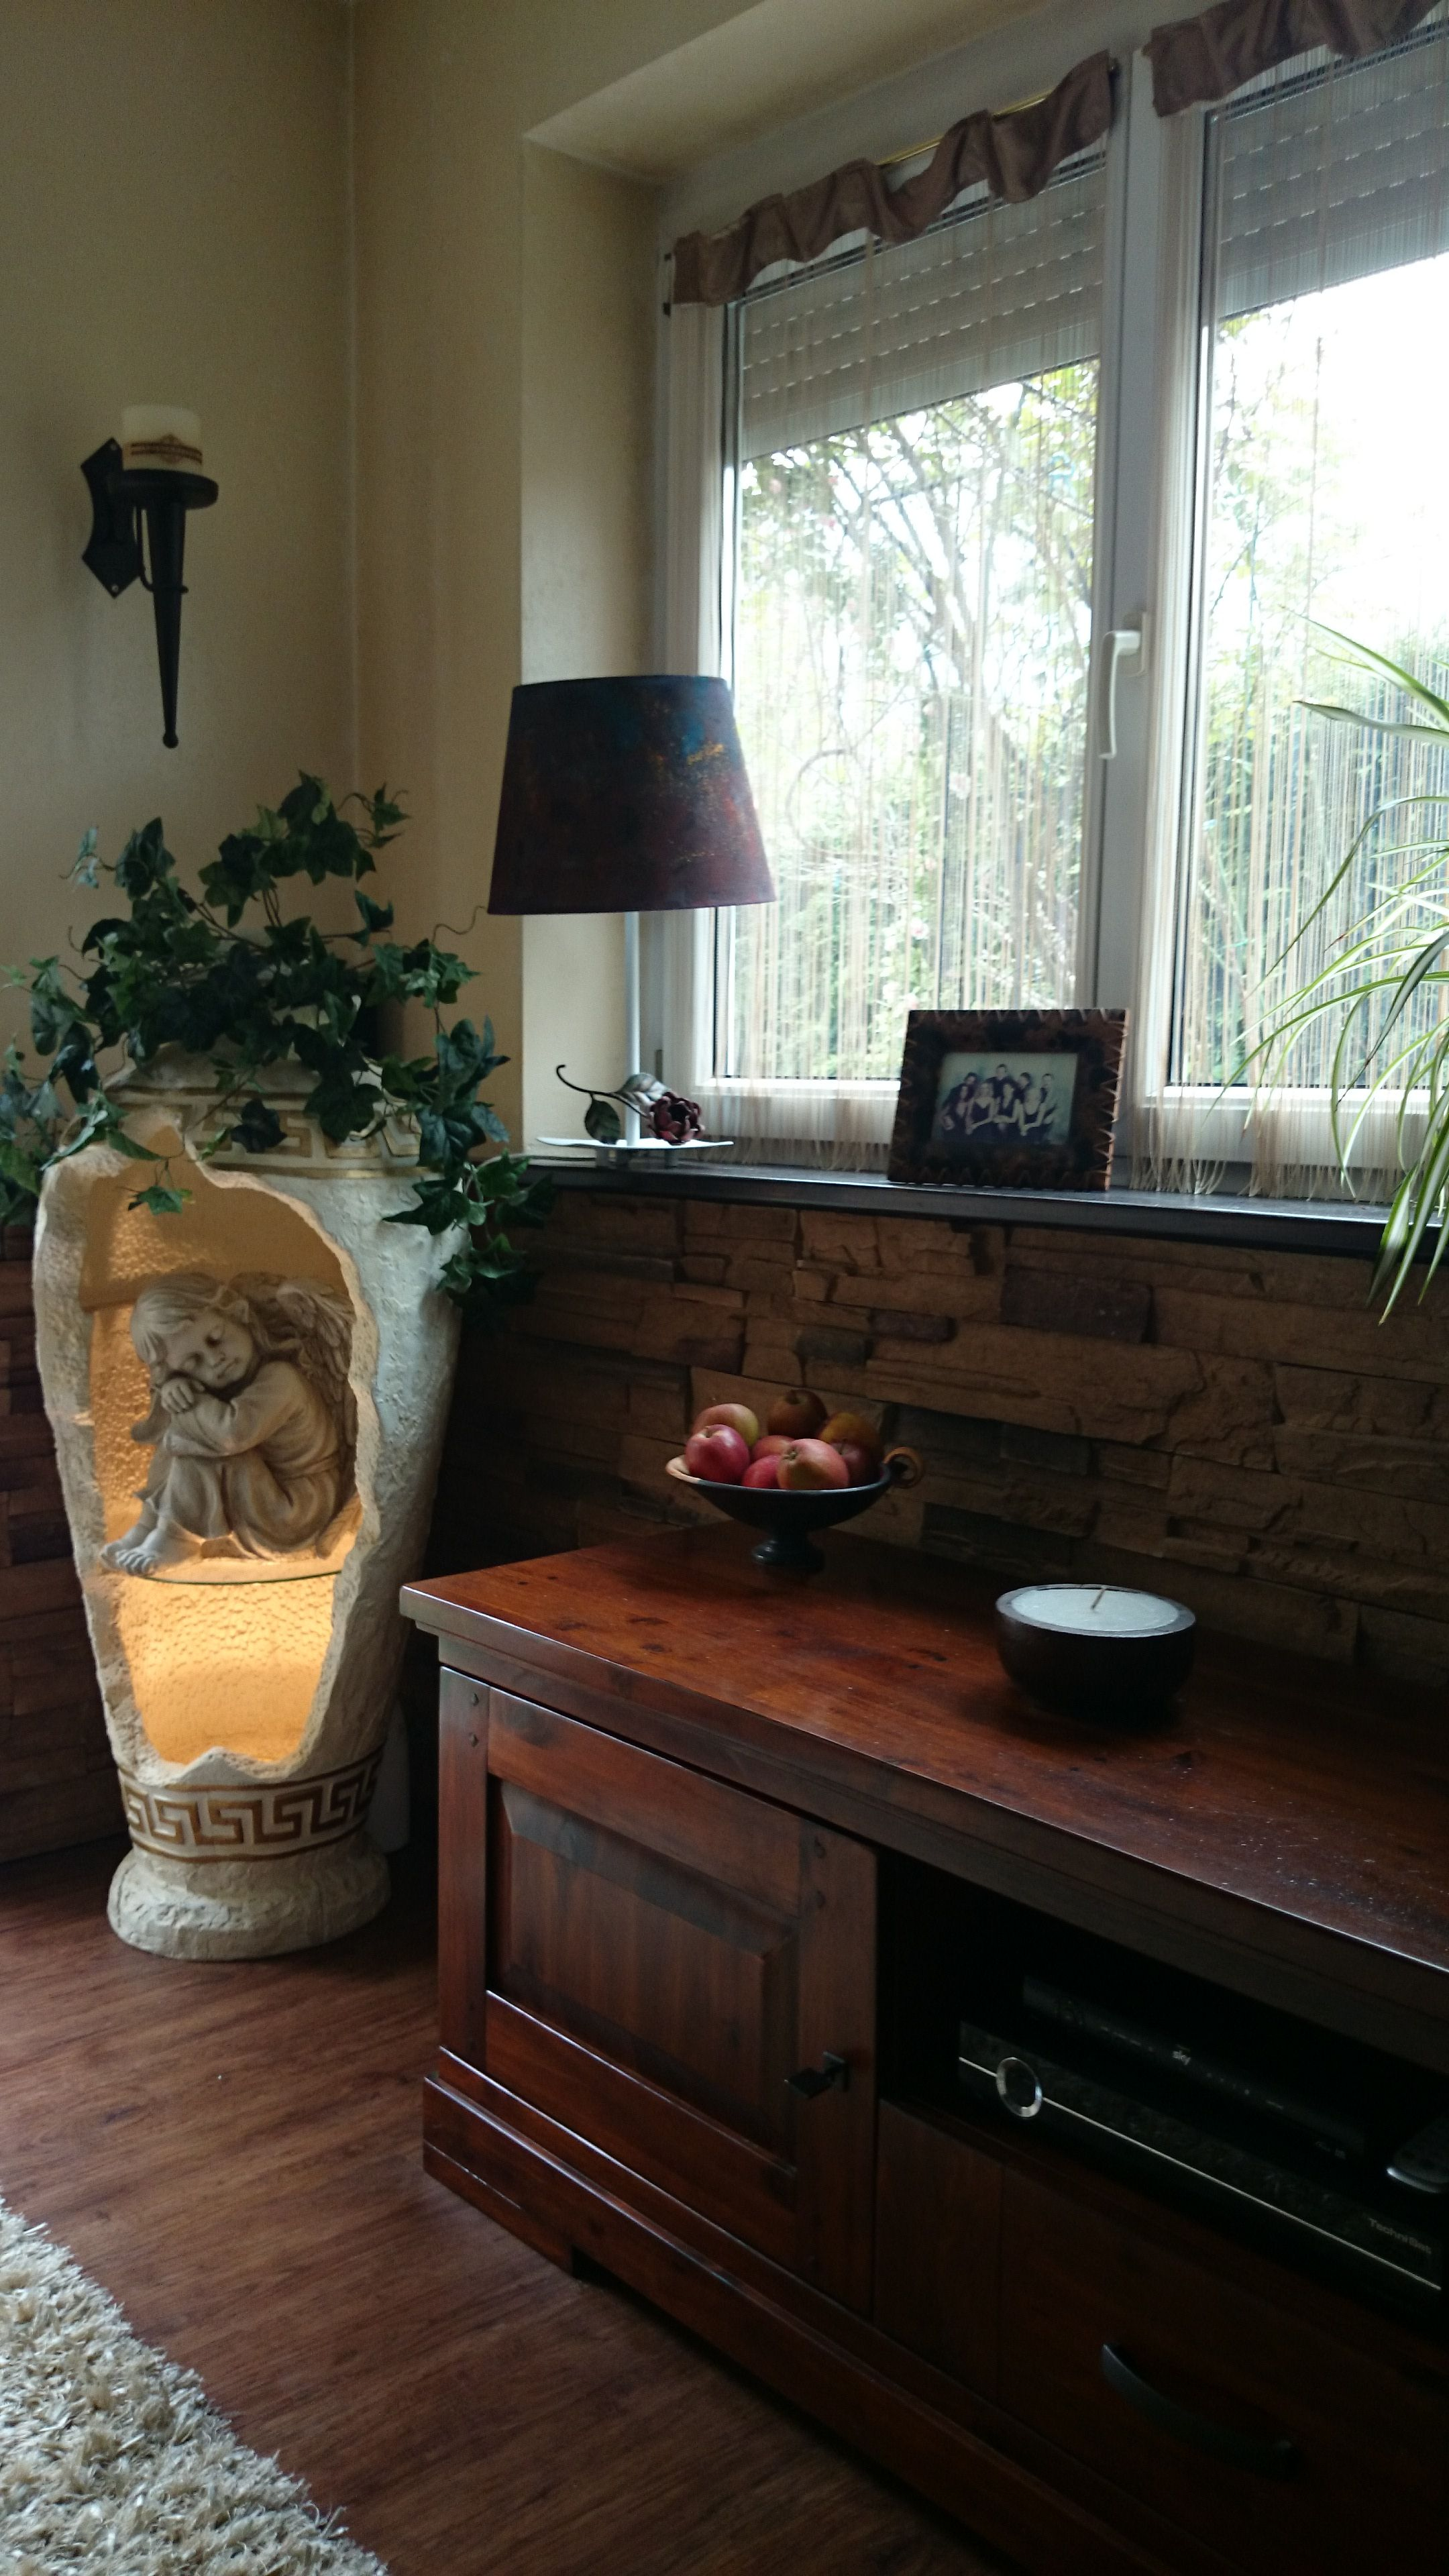 landhausstile mit lampe dora landhausstil mit lampe dora bei der einrichtung im landhausstil. Black Bedroom Furniture Sets. Home Design Ideas